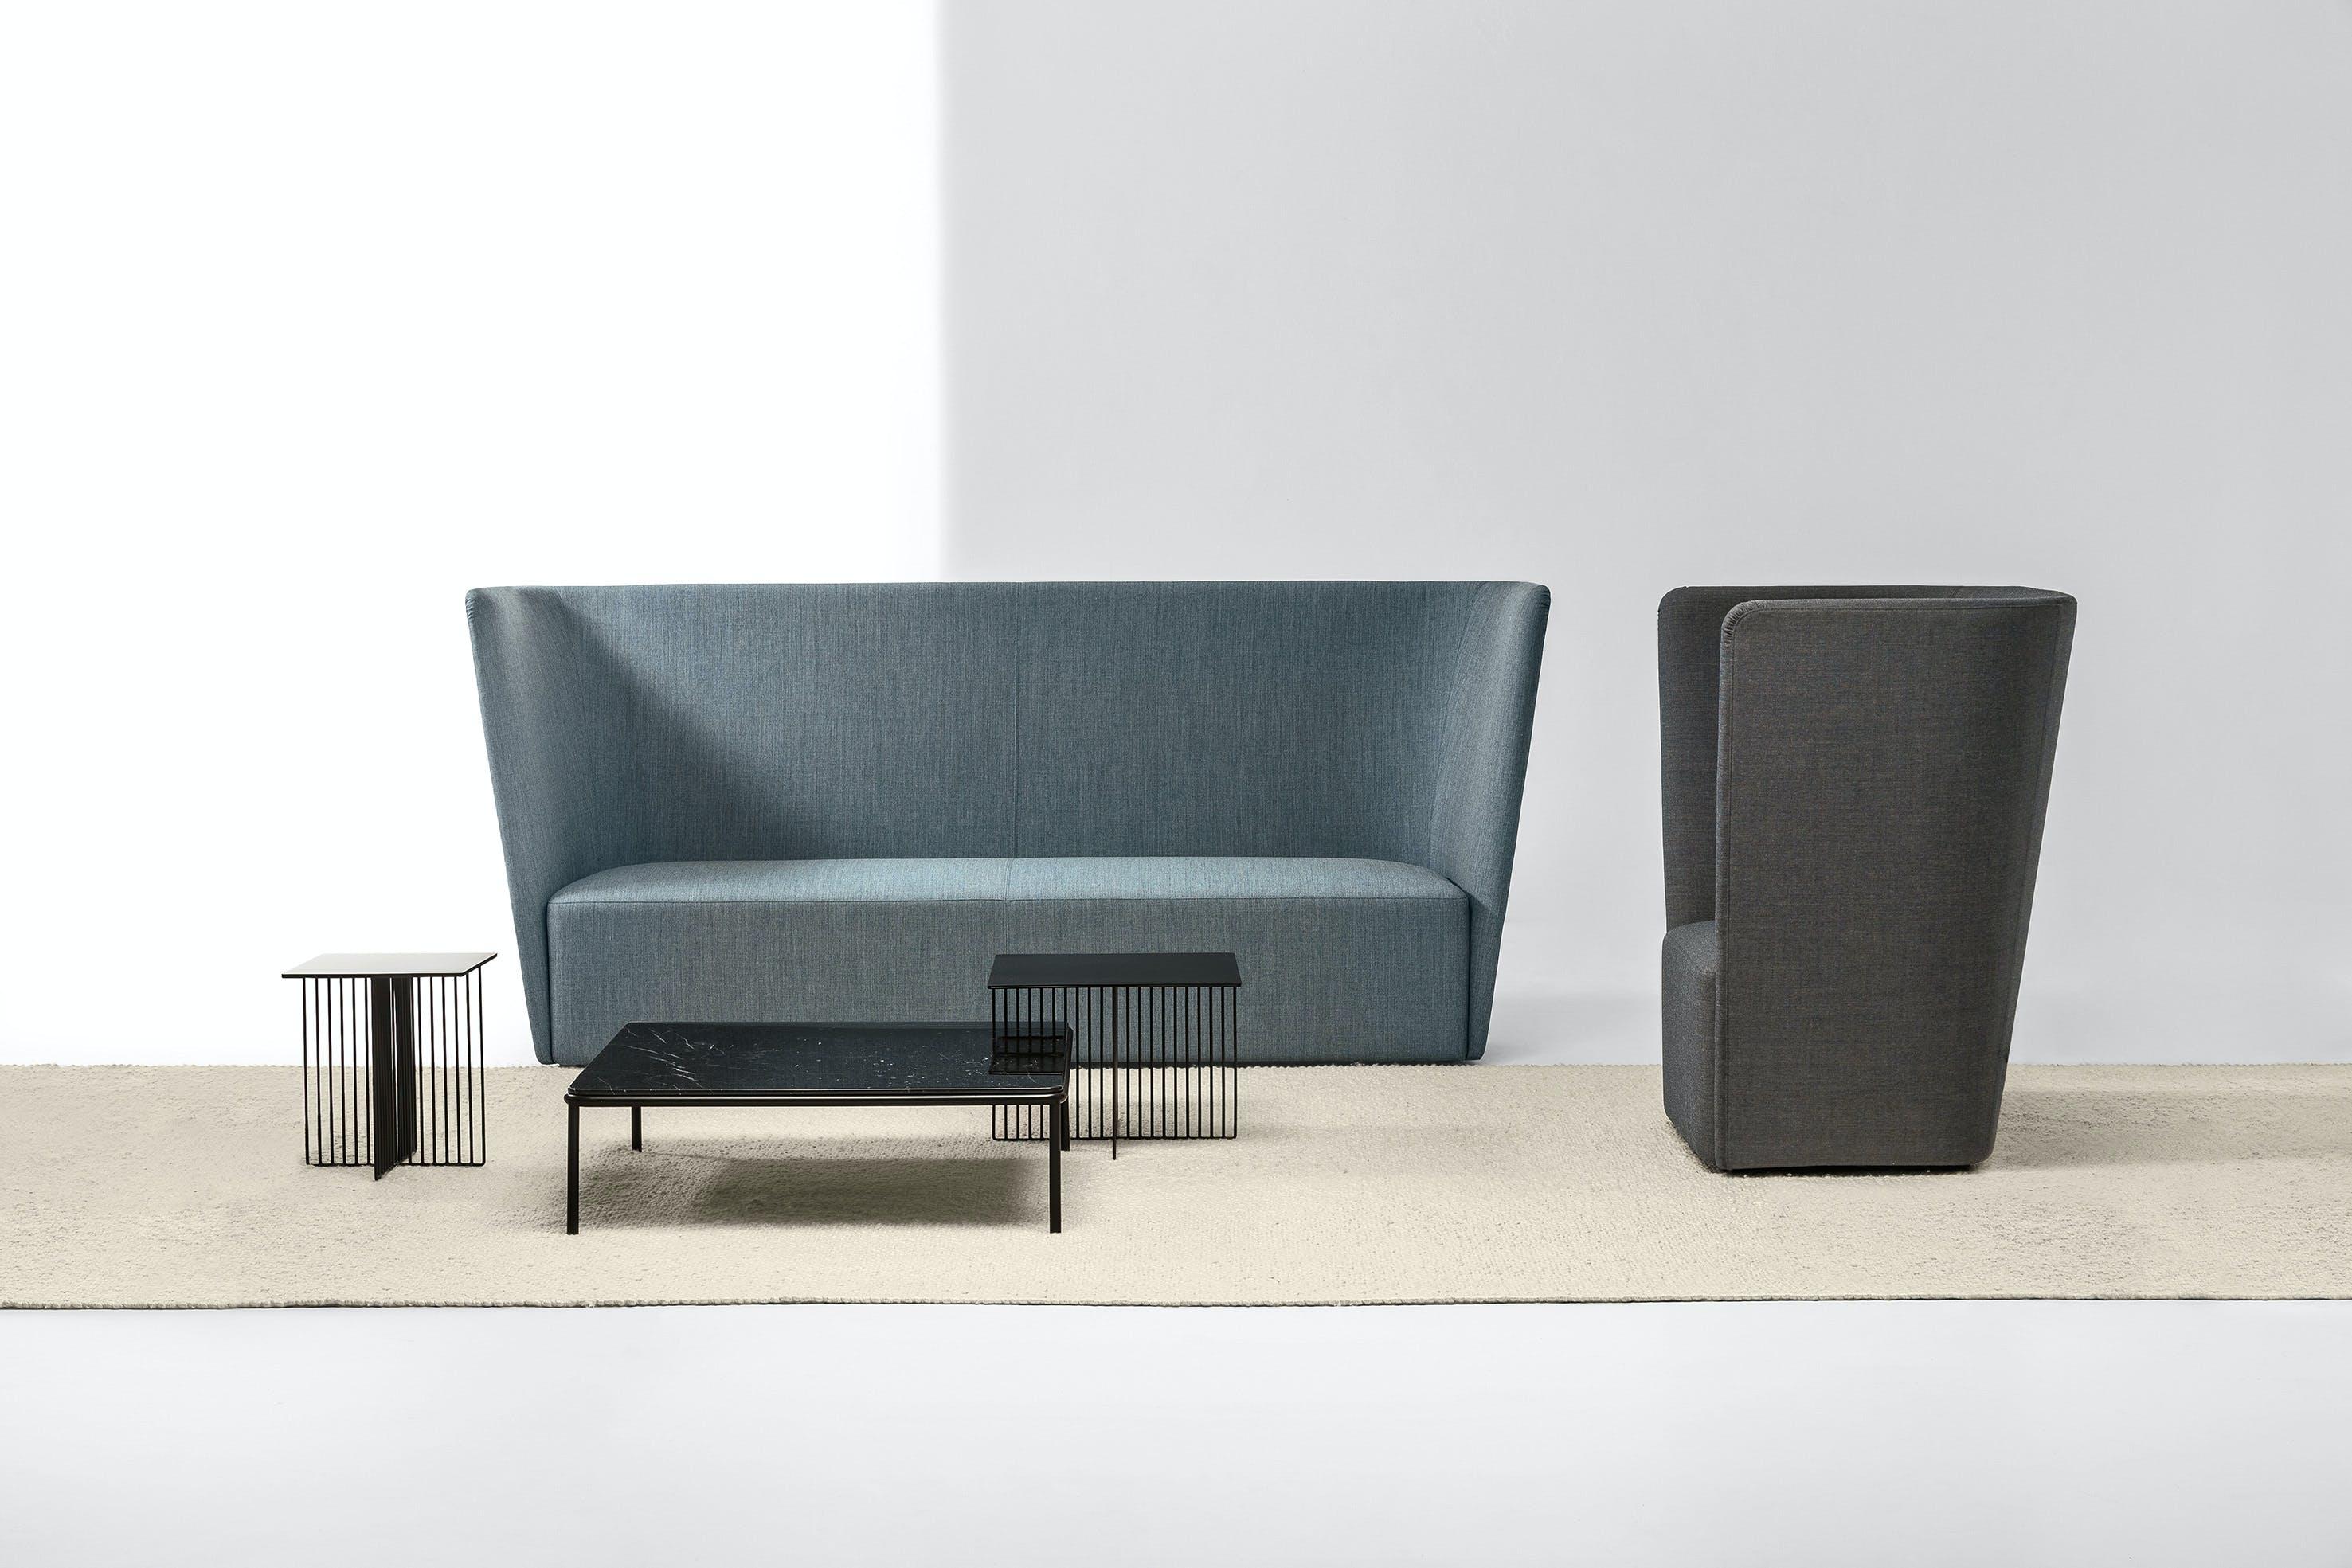 Lacividina-velour-sofa-with-chair-haute-living